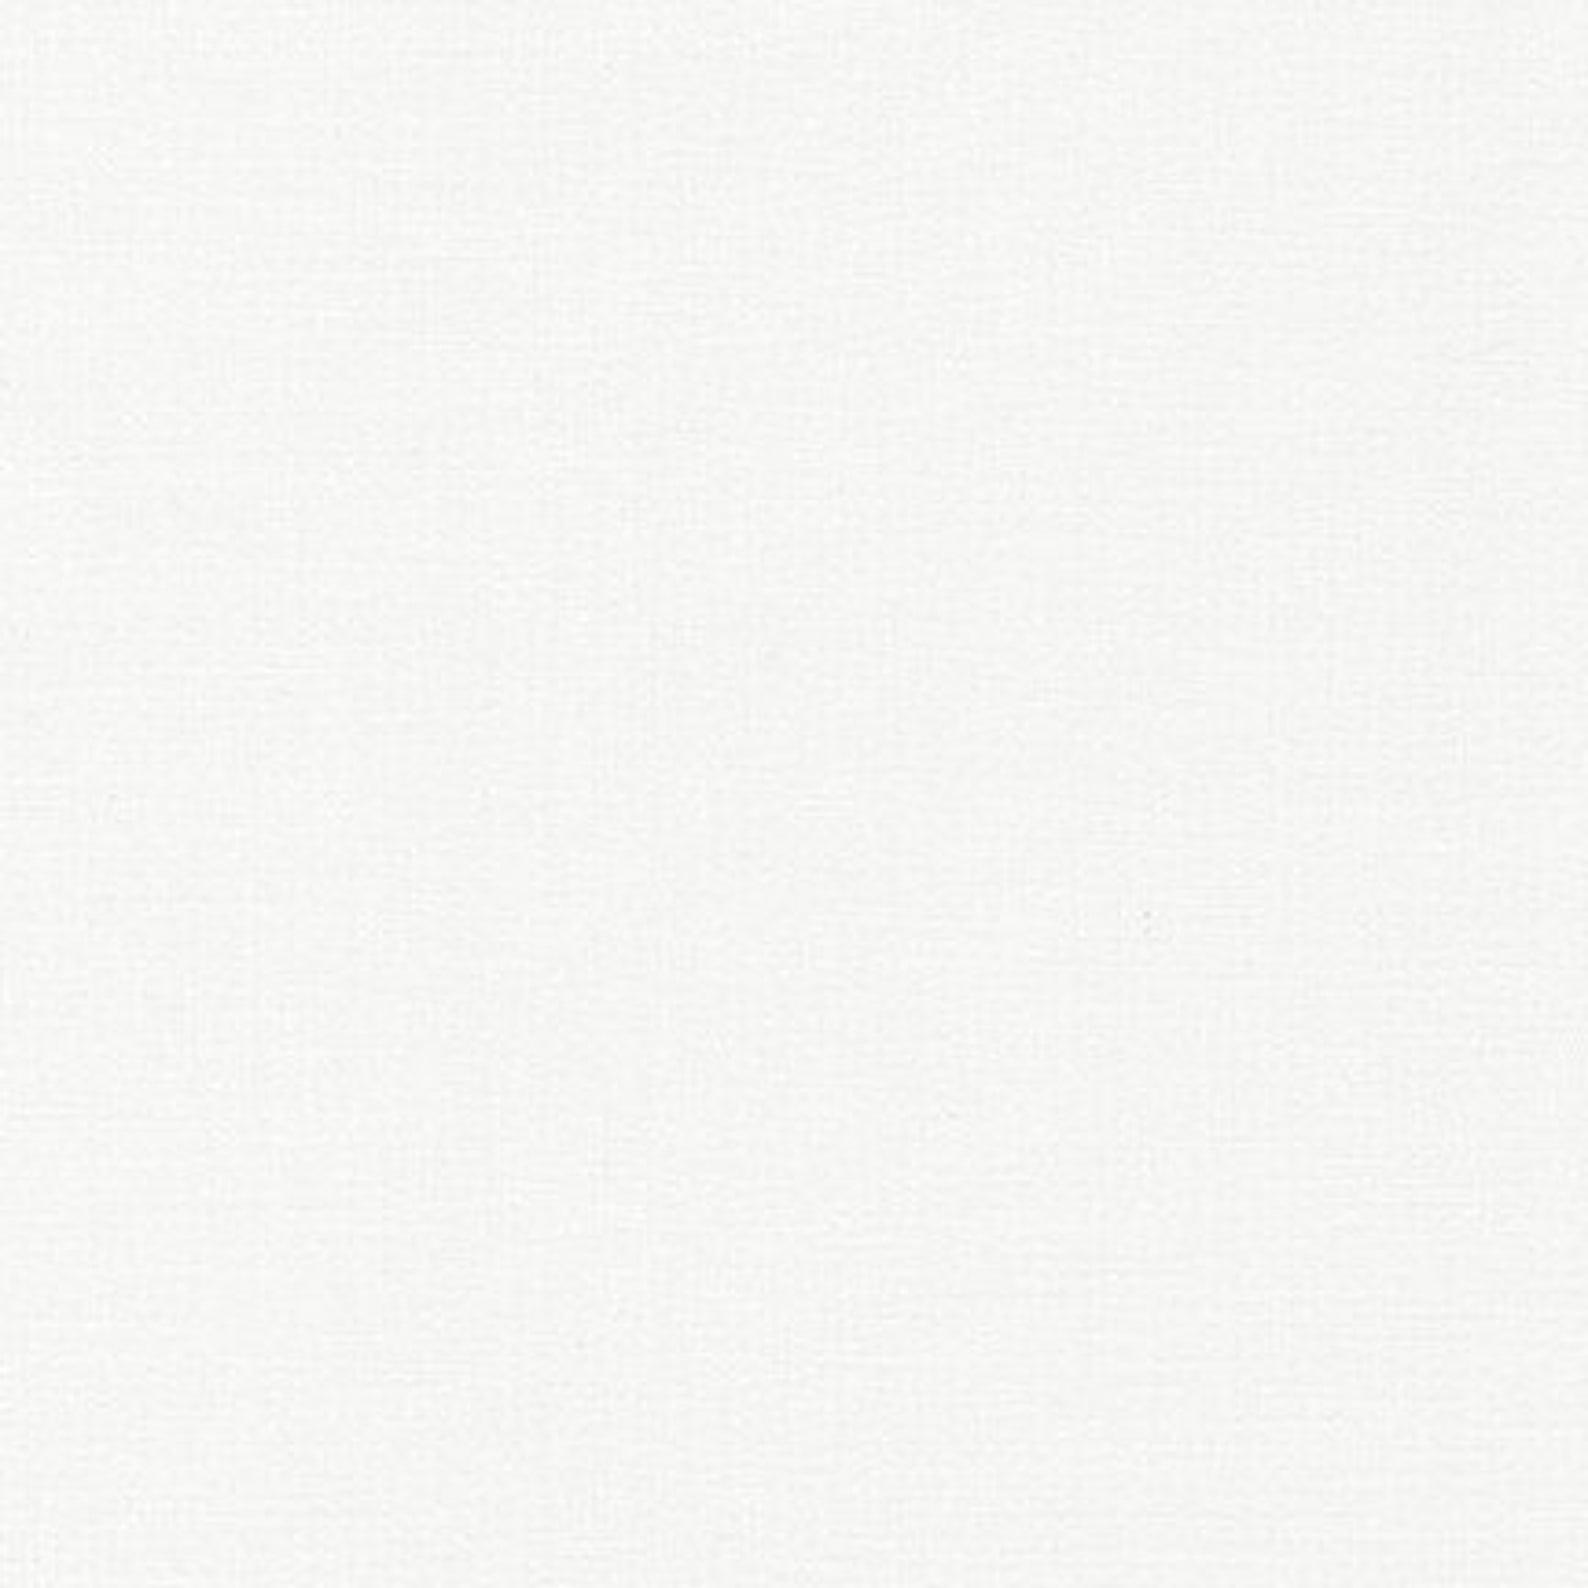 PFD Bleach White Kona Solid by Robert Kaufman